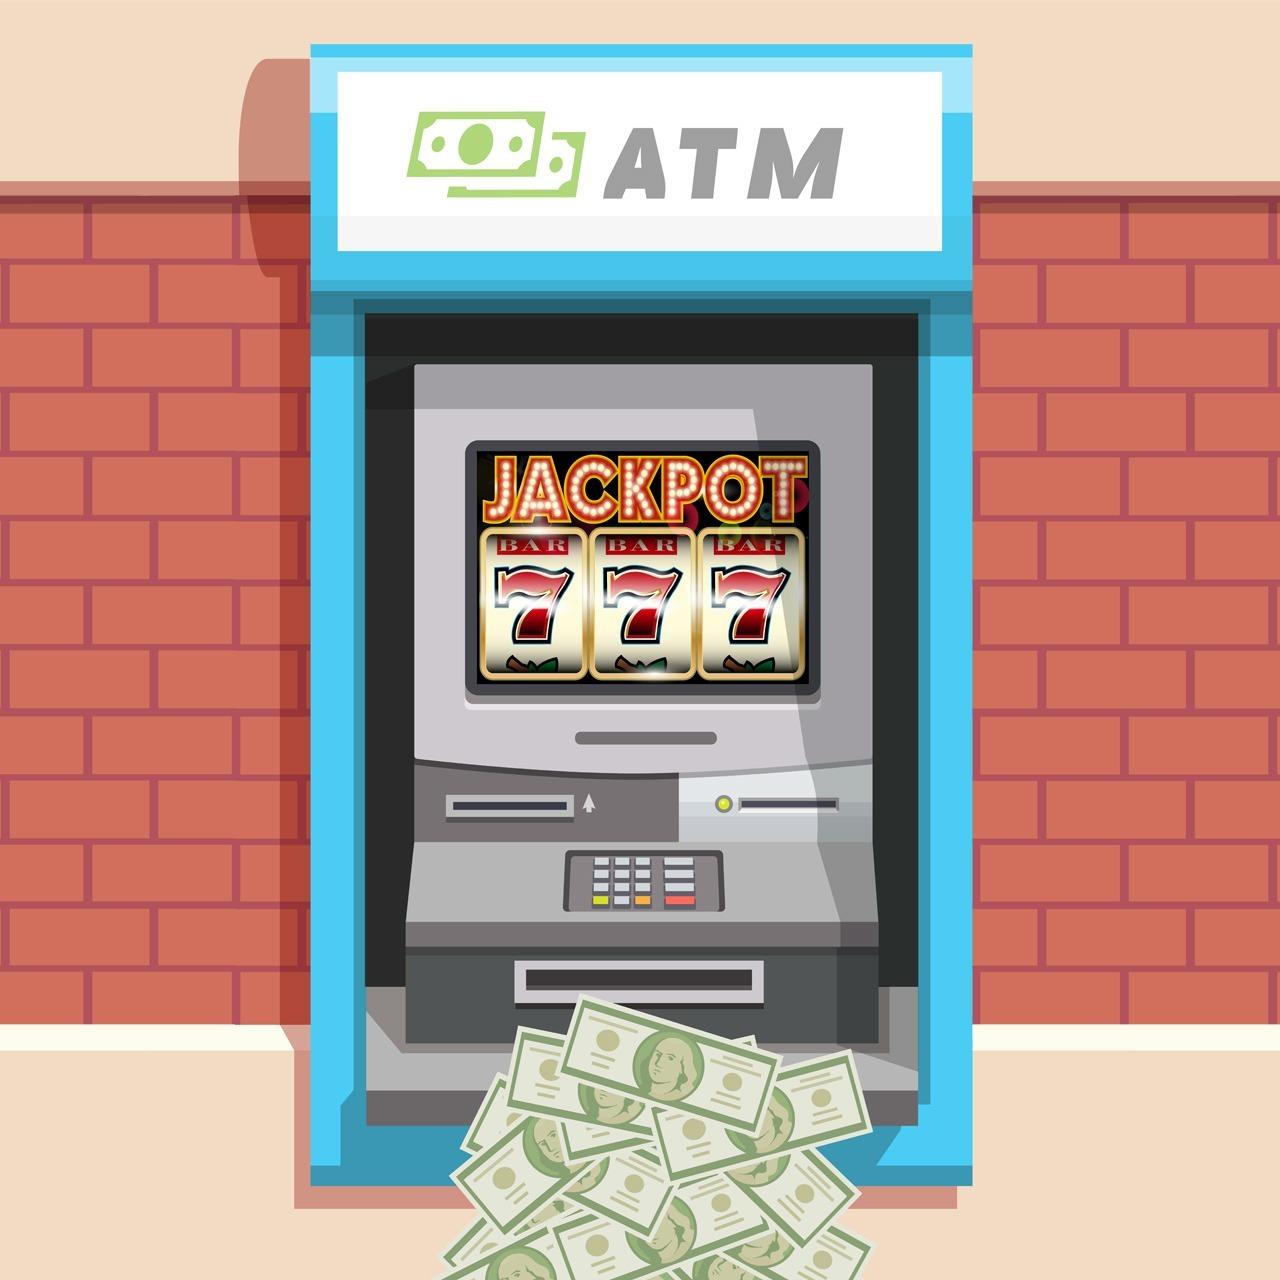 atm-jackpotting-FB